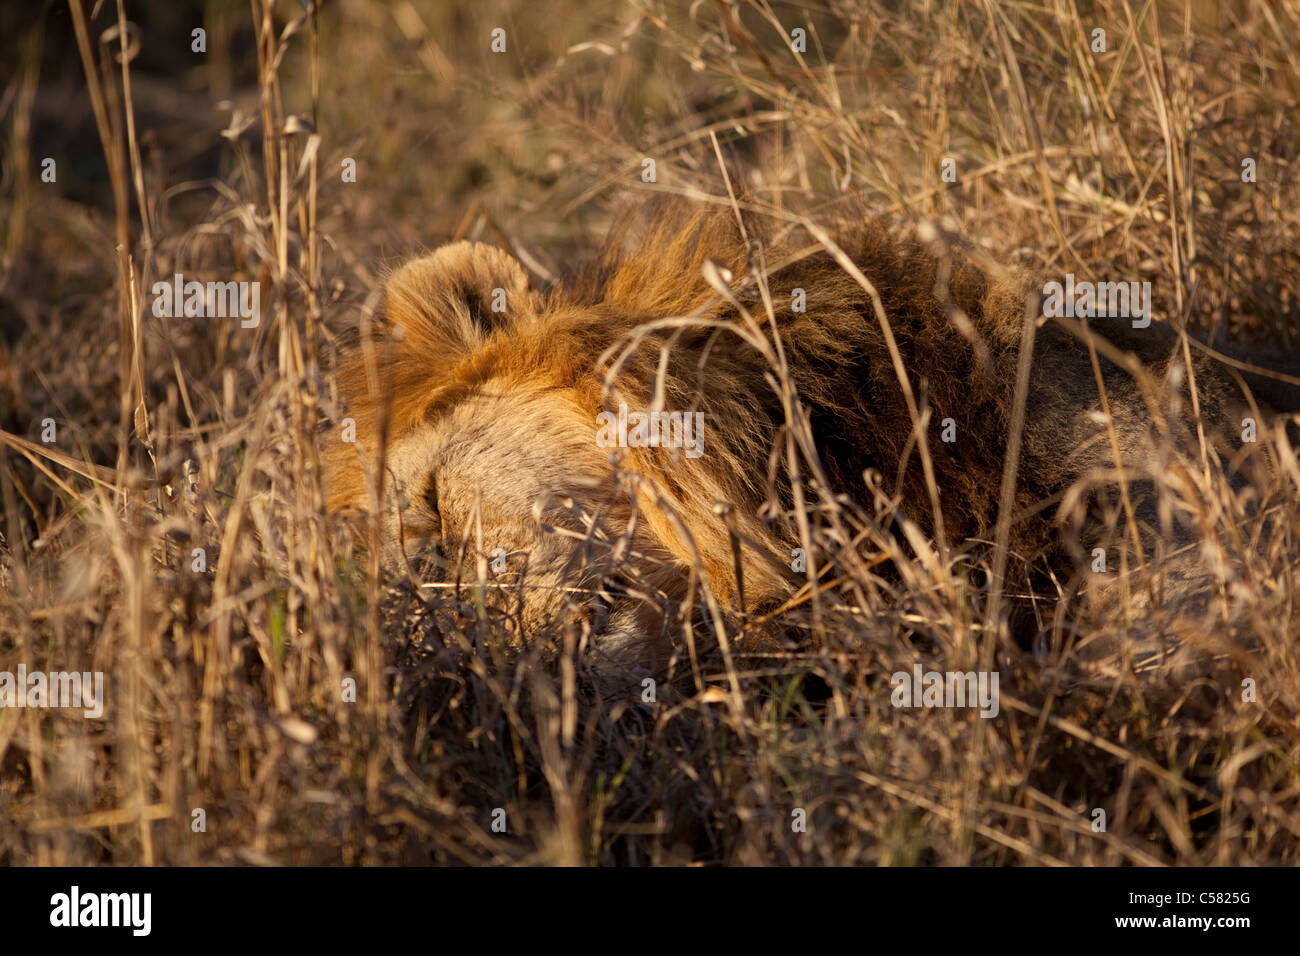 A battle scarred male lion (Panthera leo) snoozes Okavango Delta, Botswana - Stock Image